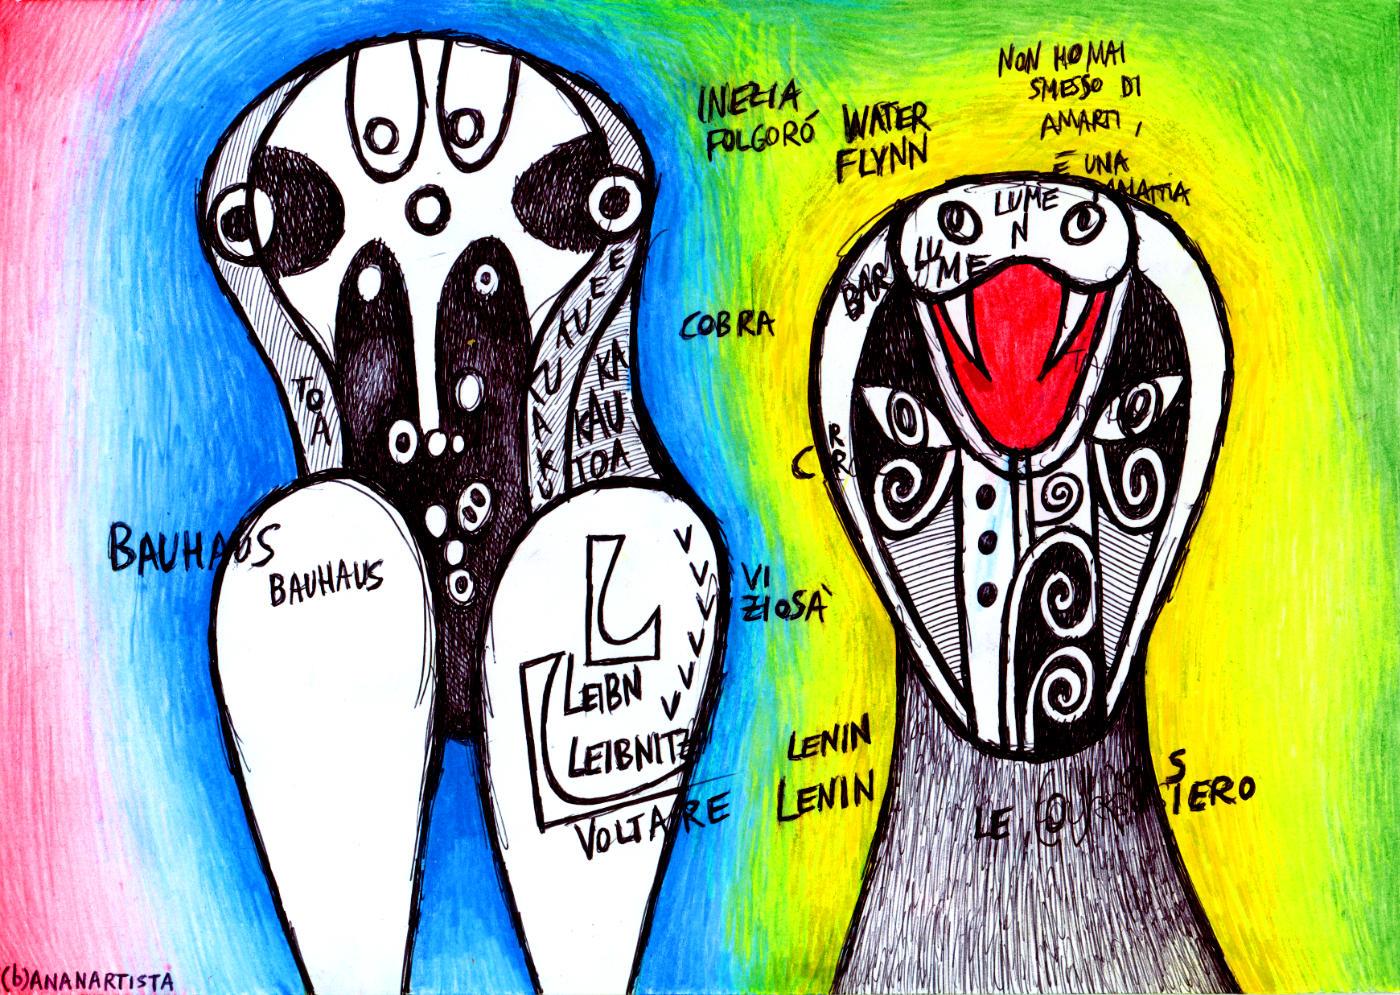 inezia folgorò - artwork di (b)ananartista sbuff